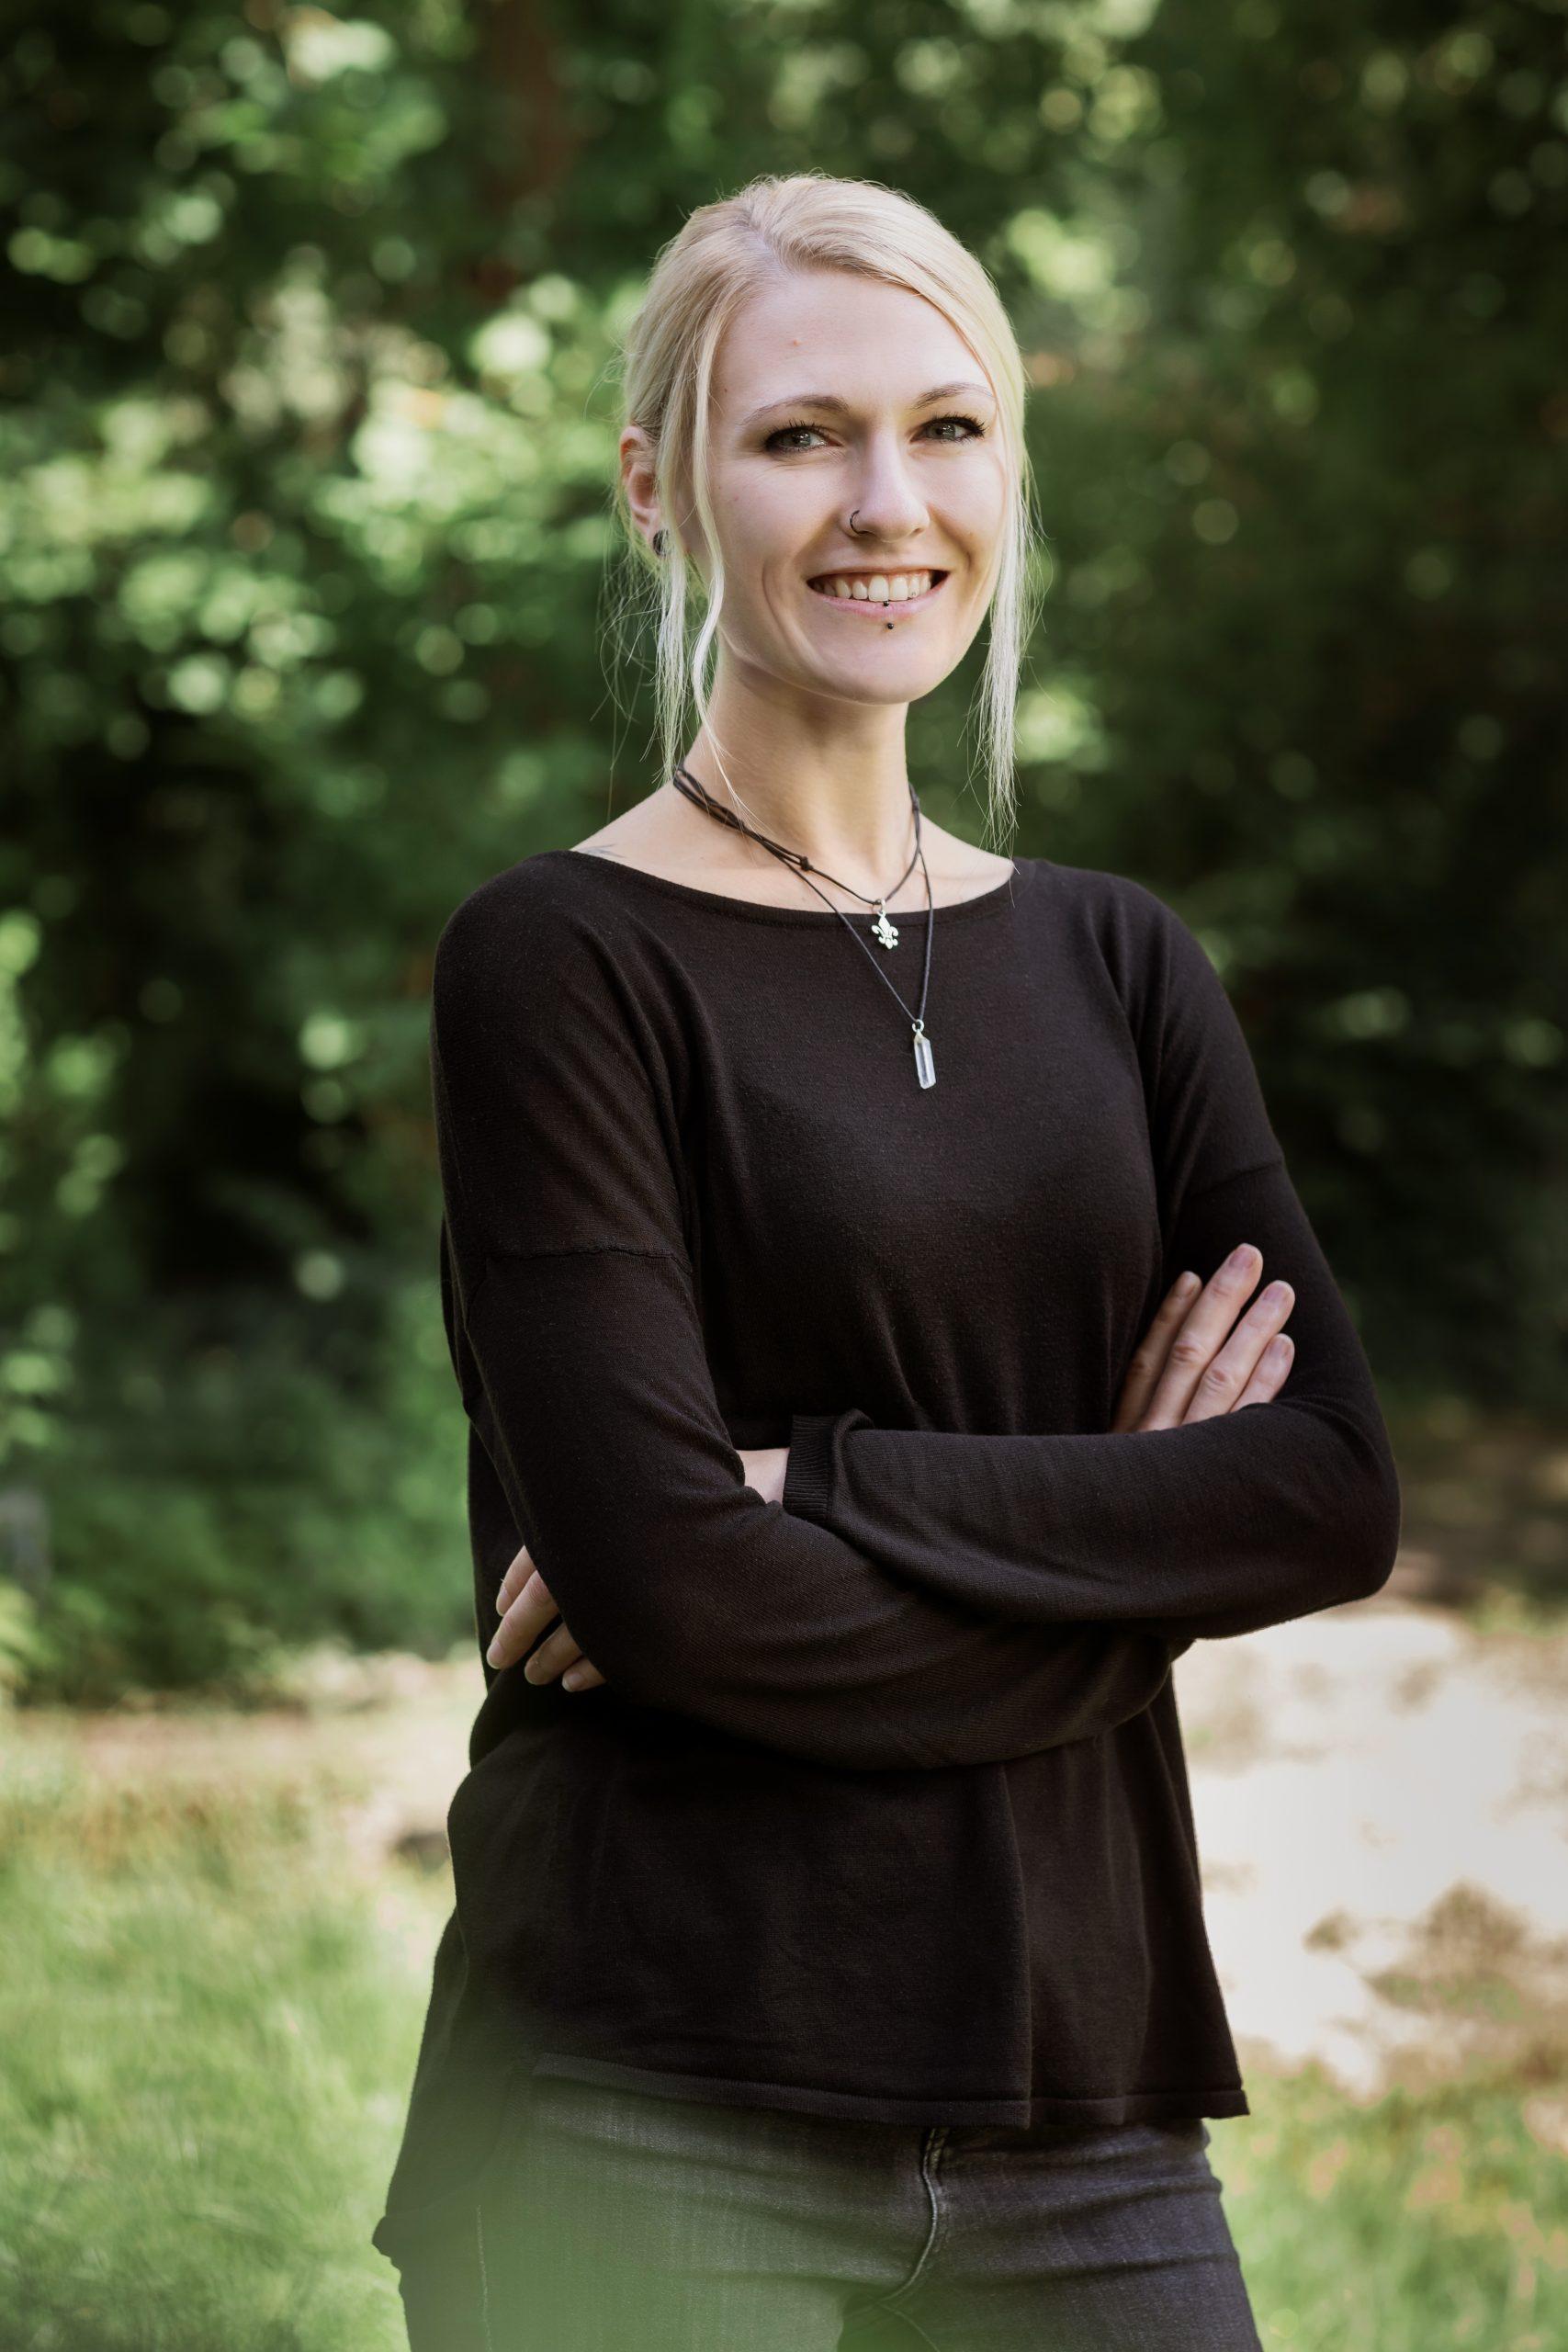 Sarah Bischl